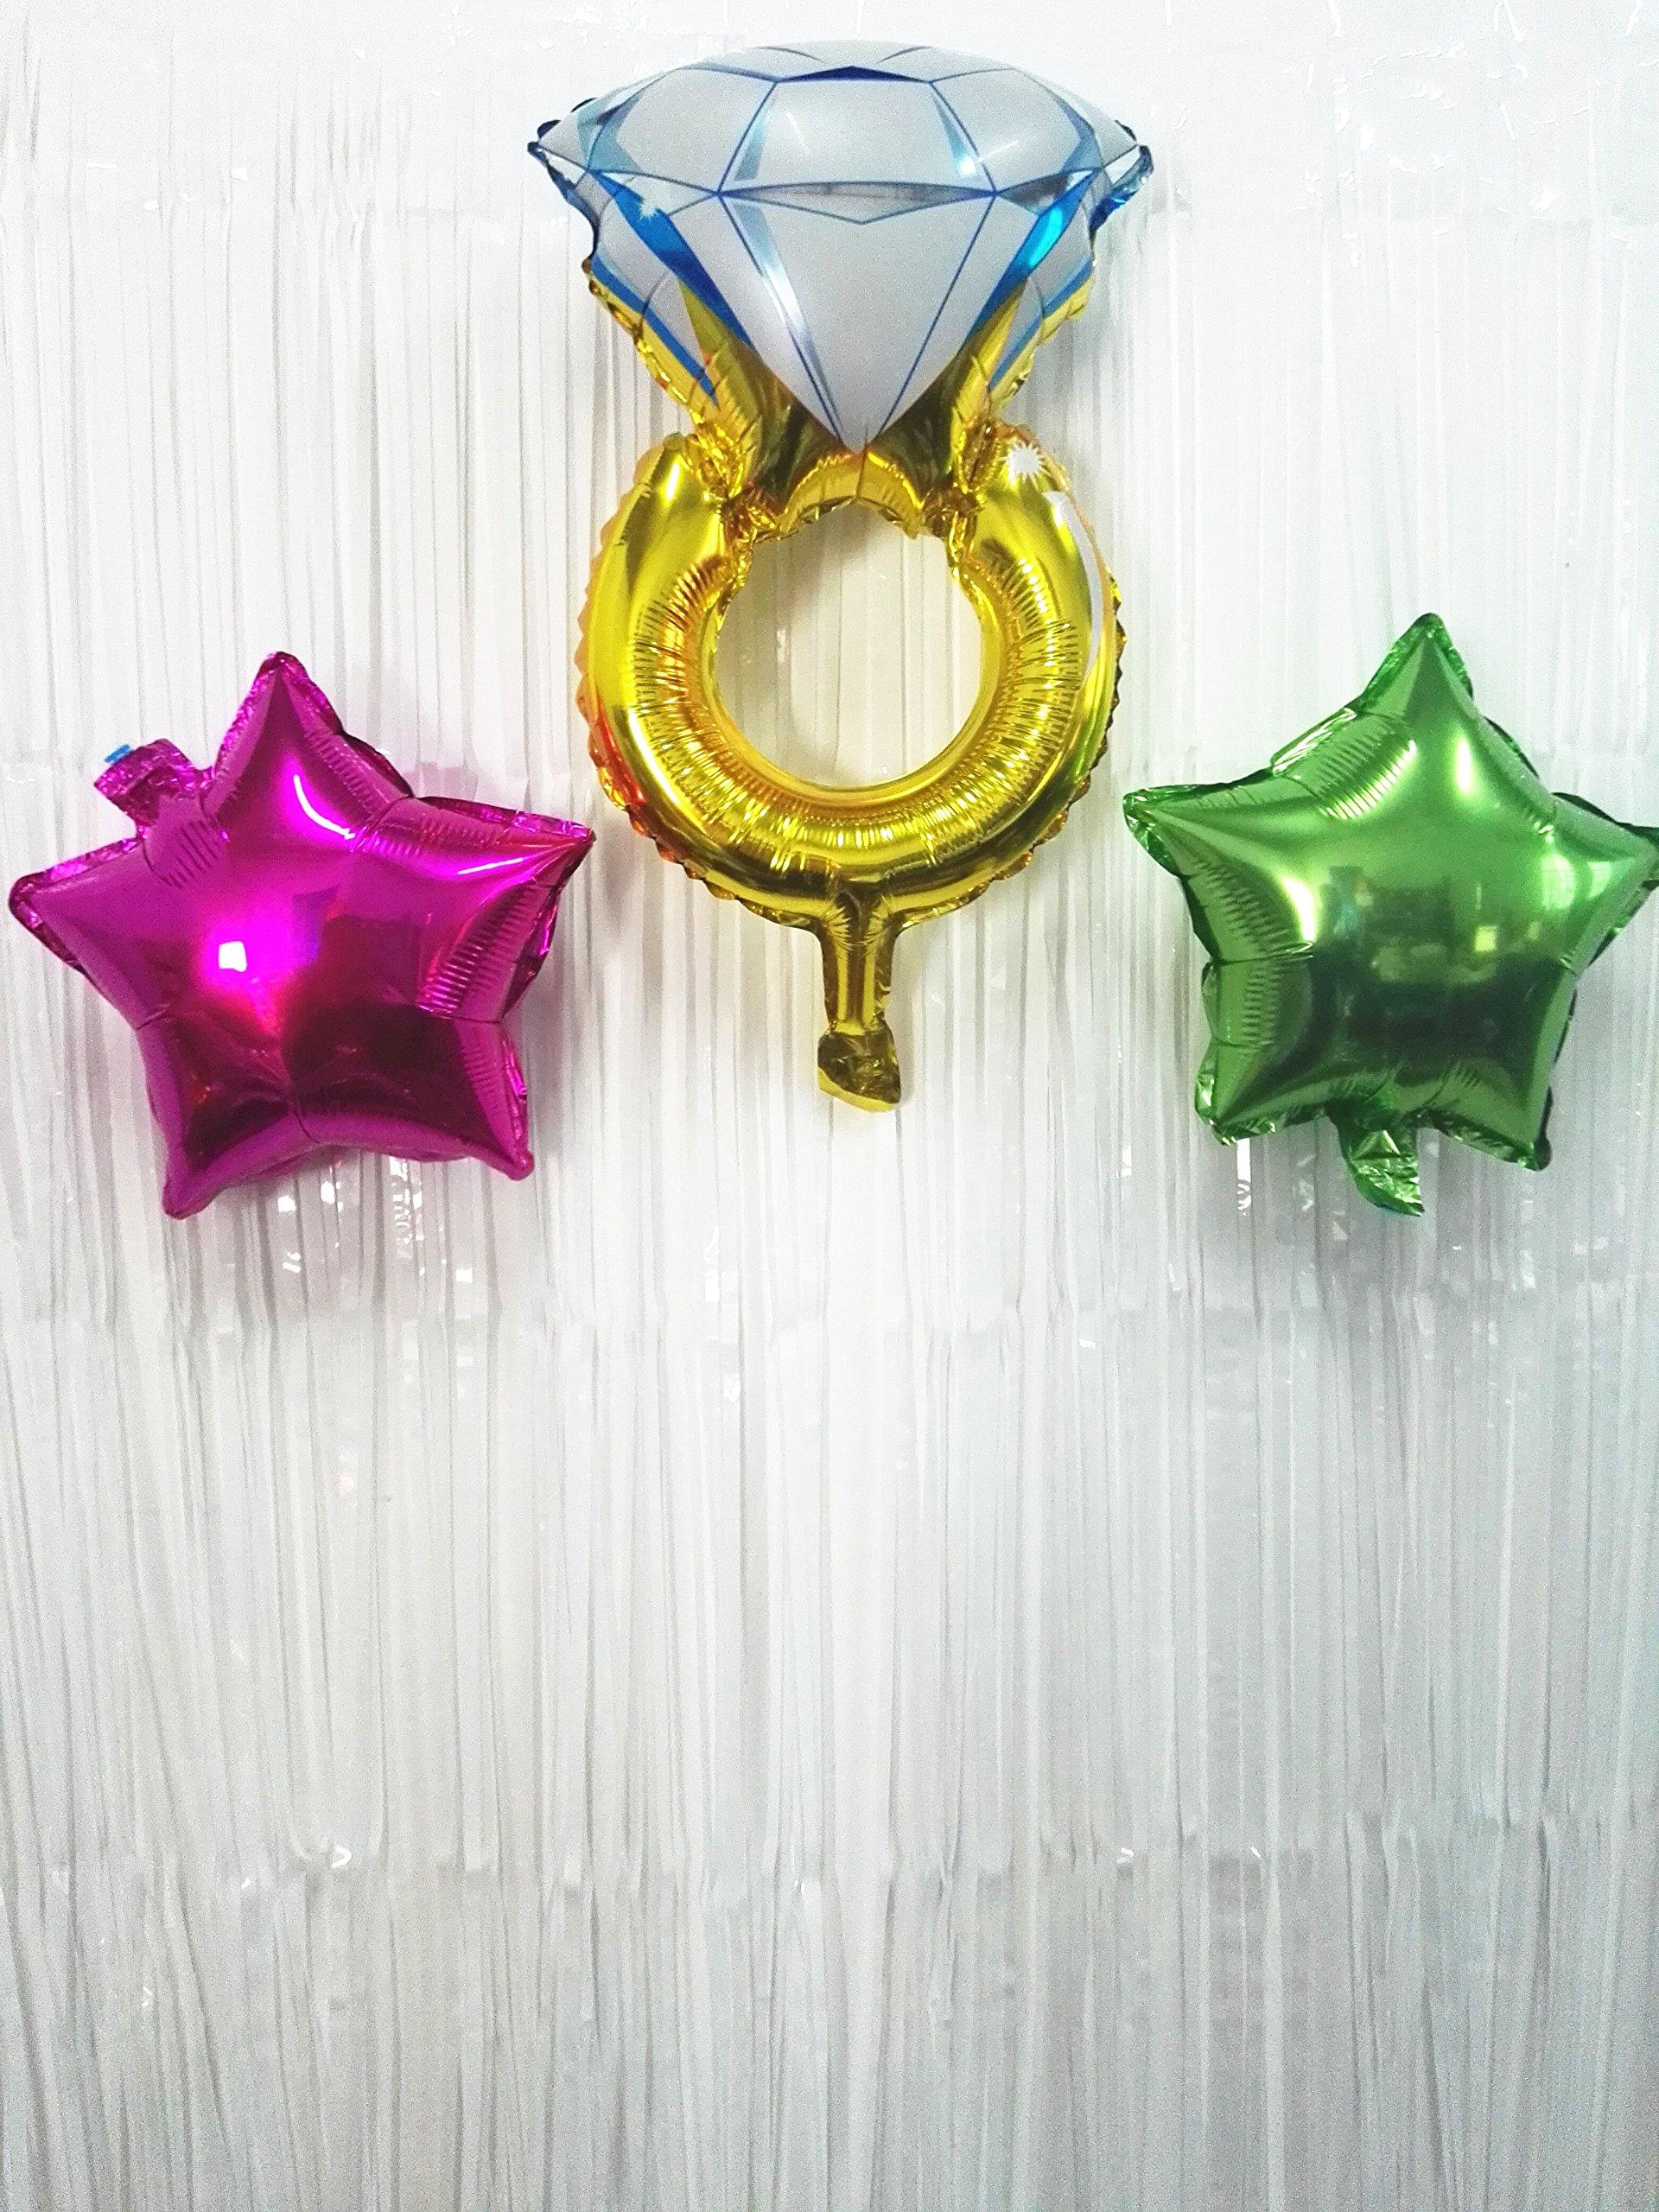 ShinyBeauty 6FTX8FT-Foil Fringe-Backdrop-White,Metallic Foil Fringe Curtains,Shimmer Foil Fringe Decoration